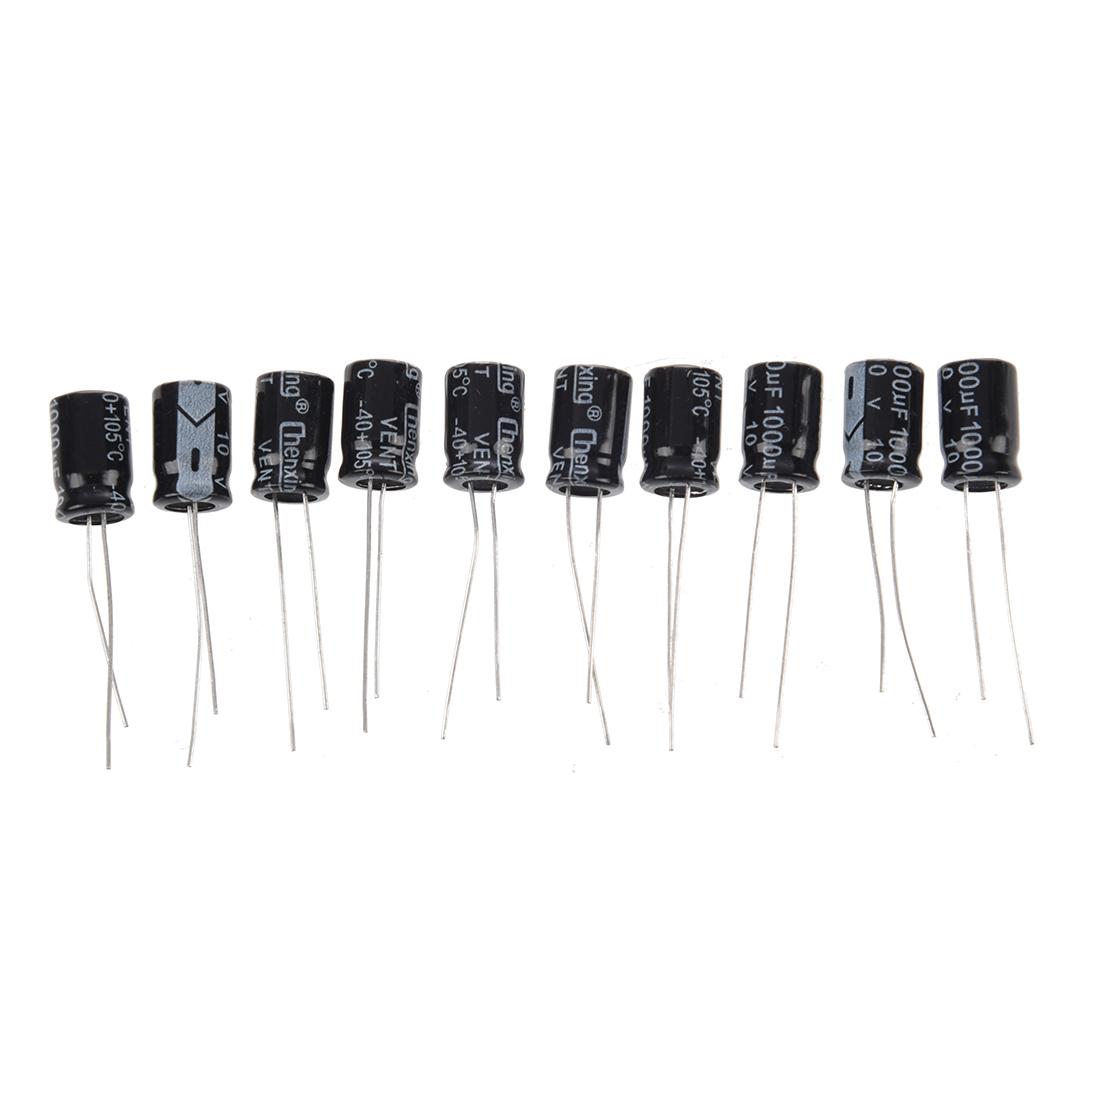 10 X Uf 10v 105c Radial Electrolytic Capacitor 8x11mm